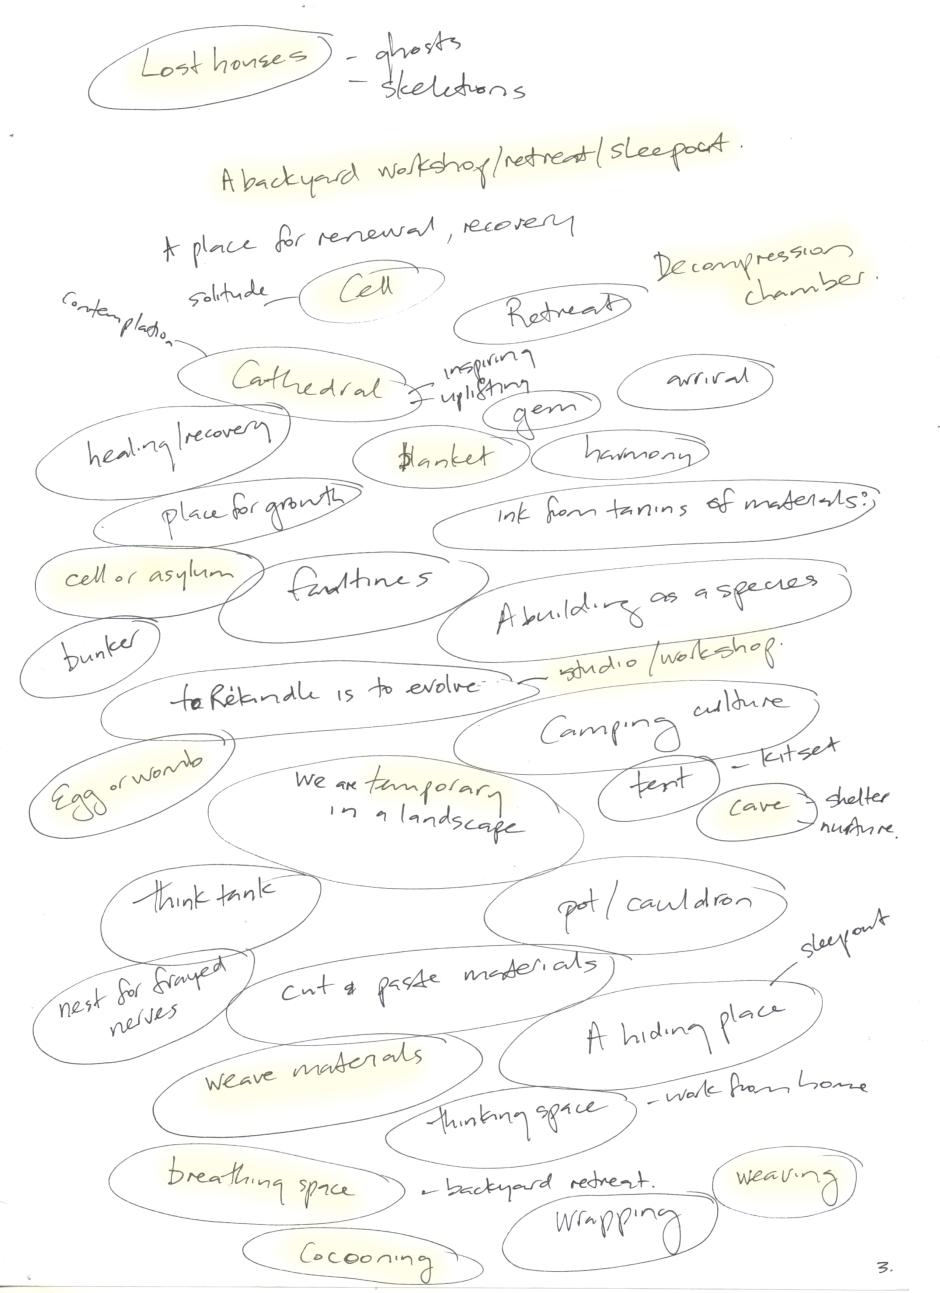 4.Brainstorm